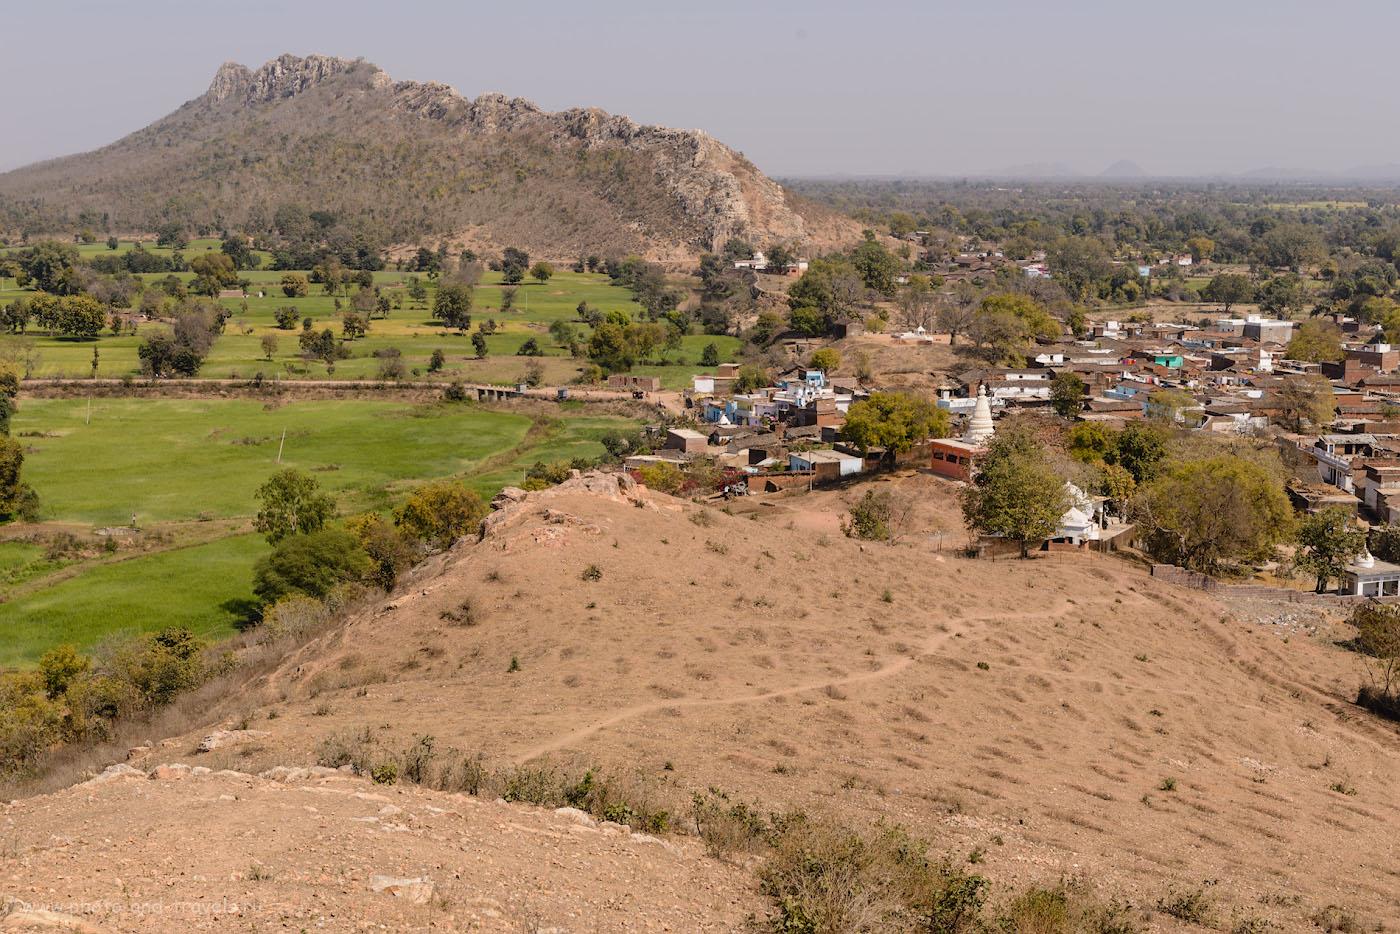 Фото 24. Вид на холм Dantla Hill и деревушка, к которой мы приехали из Кхаджурахо на велосипеде. 1/250, 9.0, 100, 55.